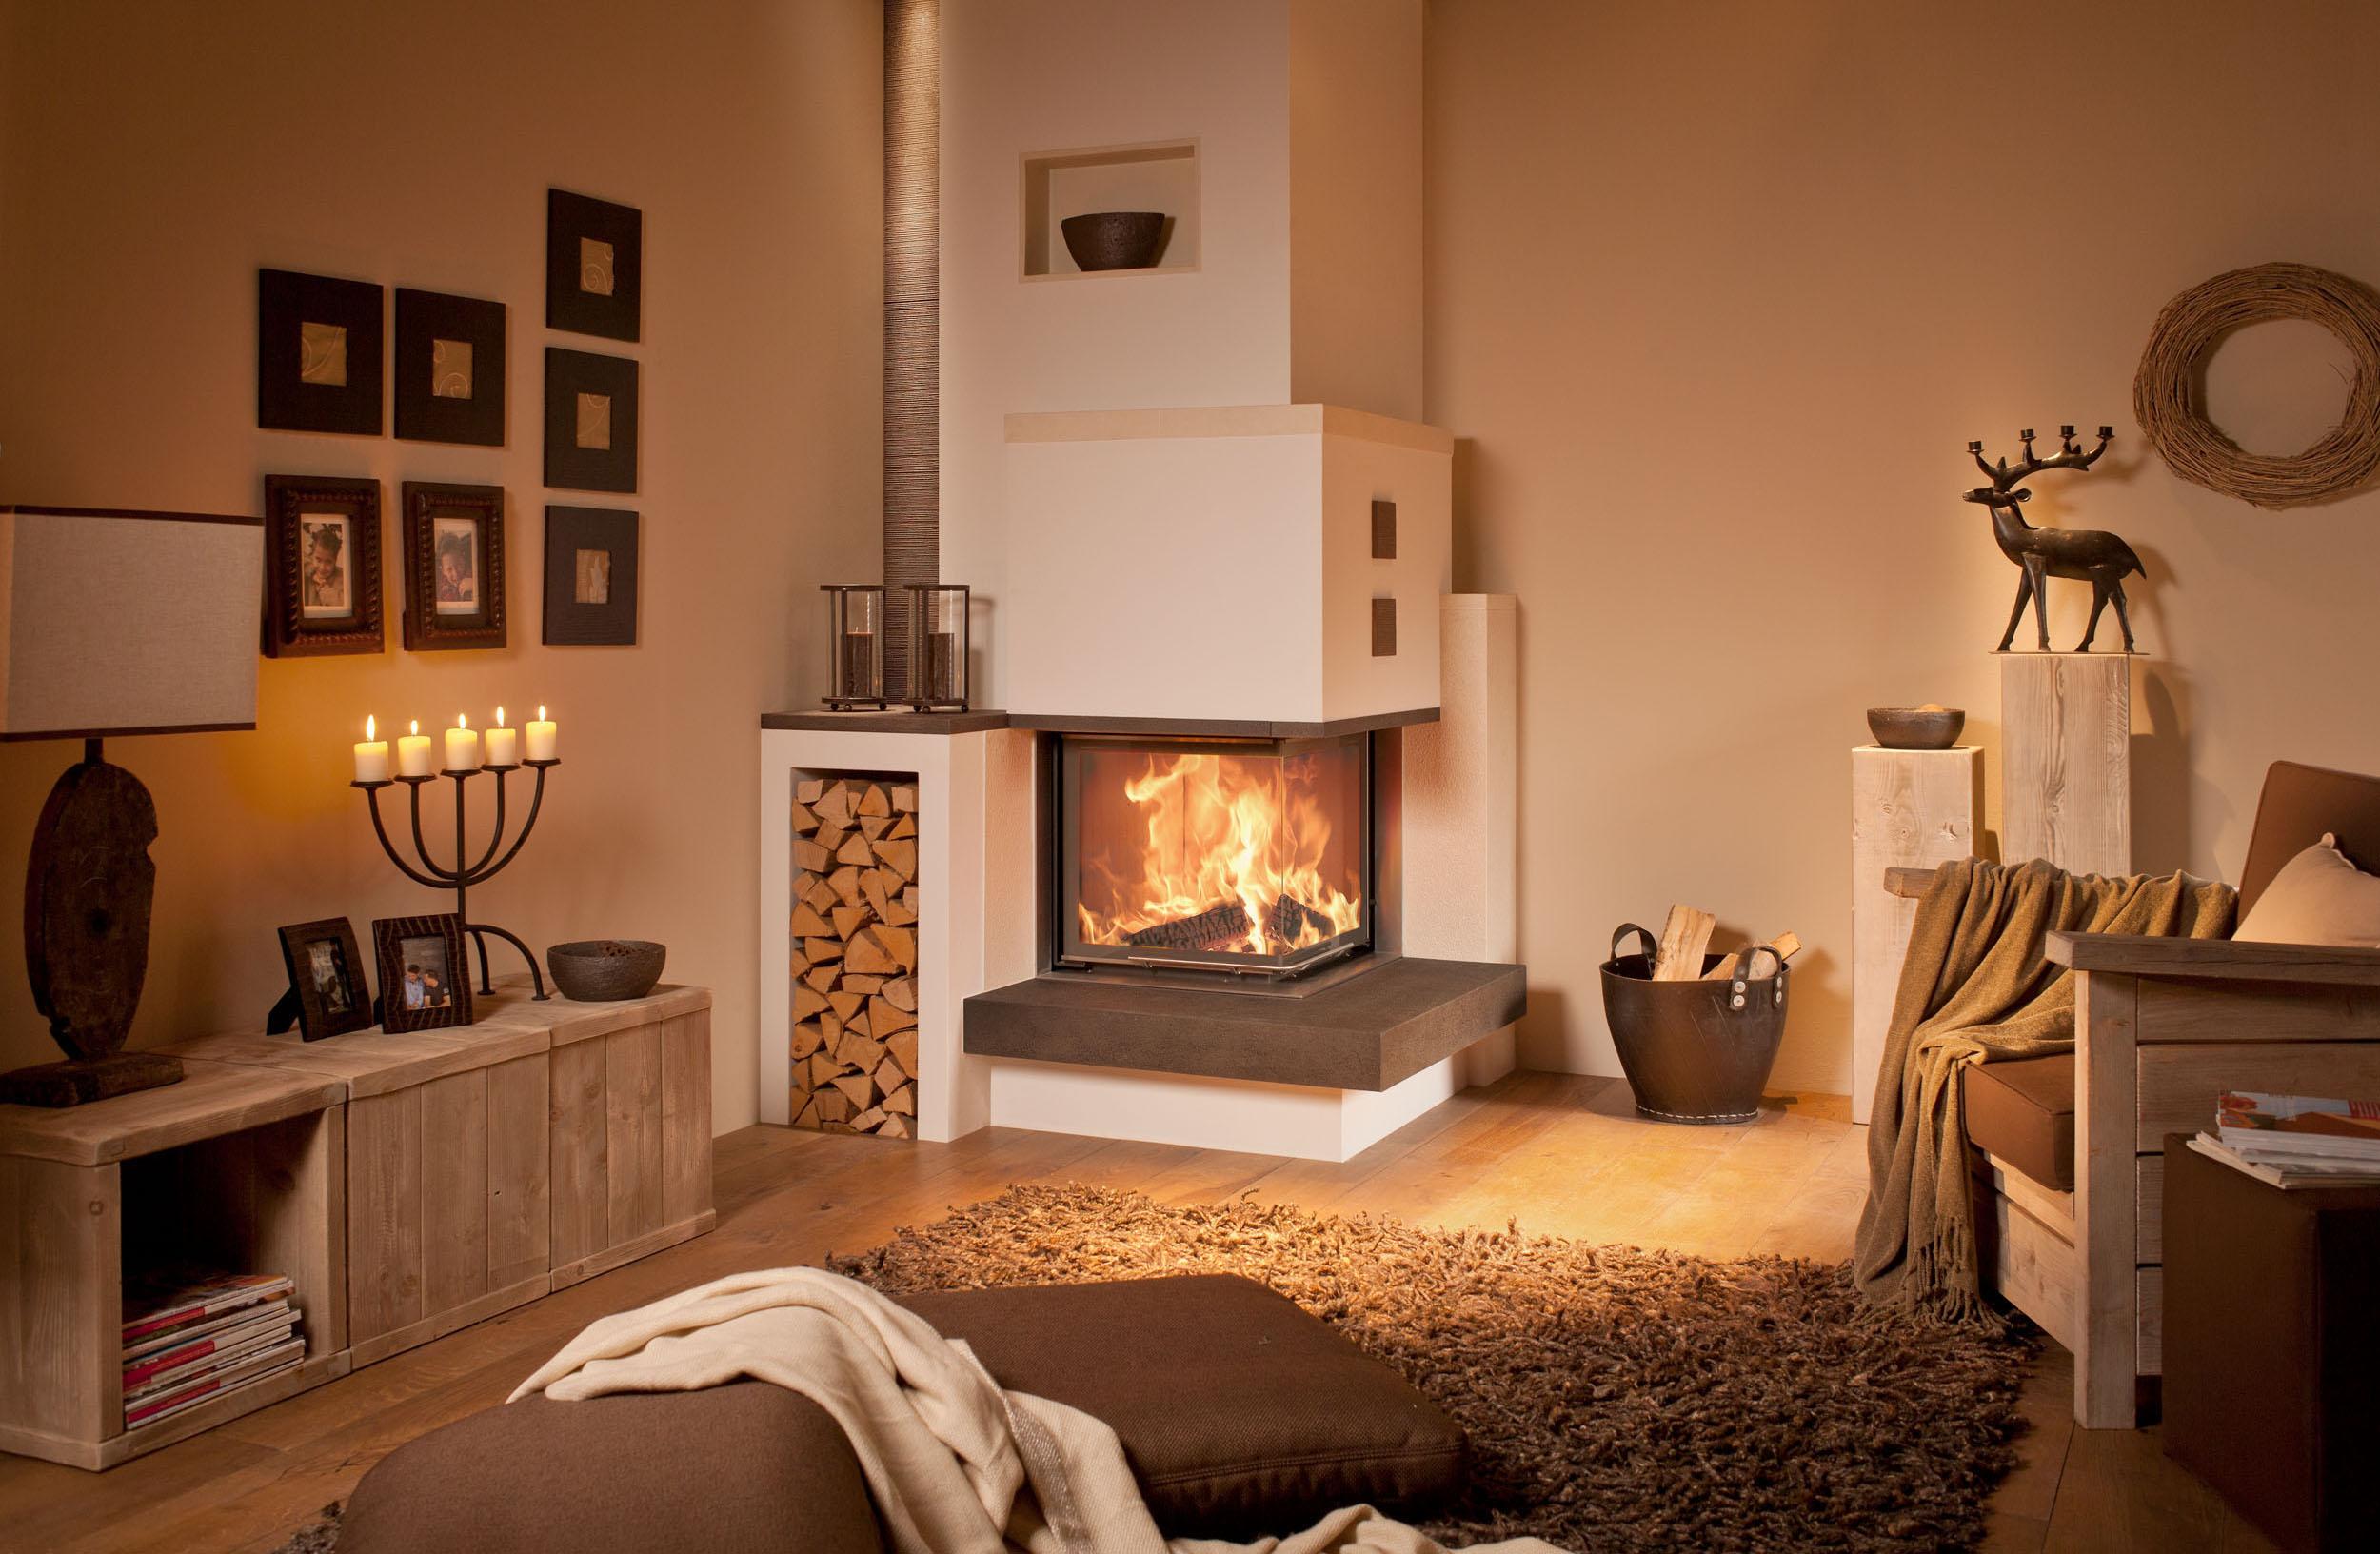 kreuzer kachel fen oberweis bei gmunden kachelofen. Black Bedroom Furniture Sets. Home Design Ideas